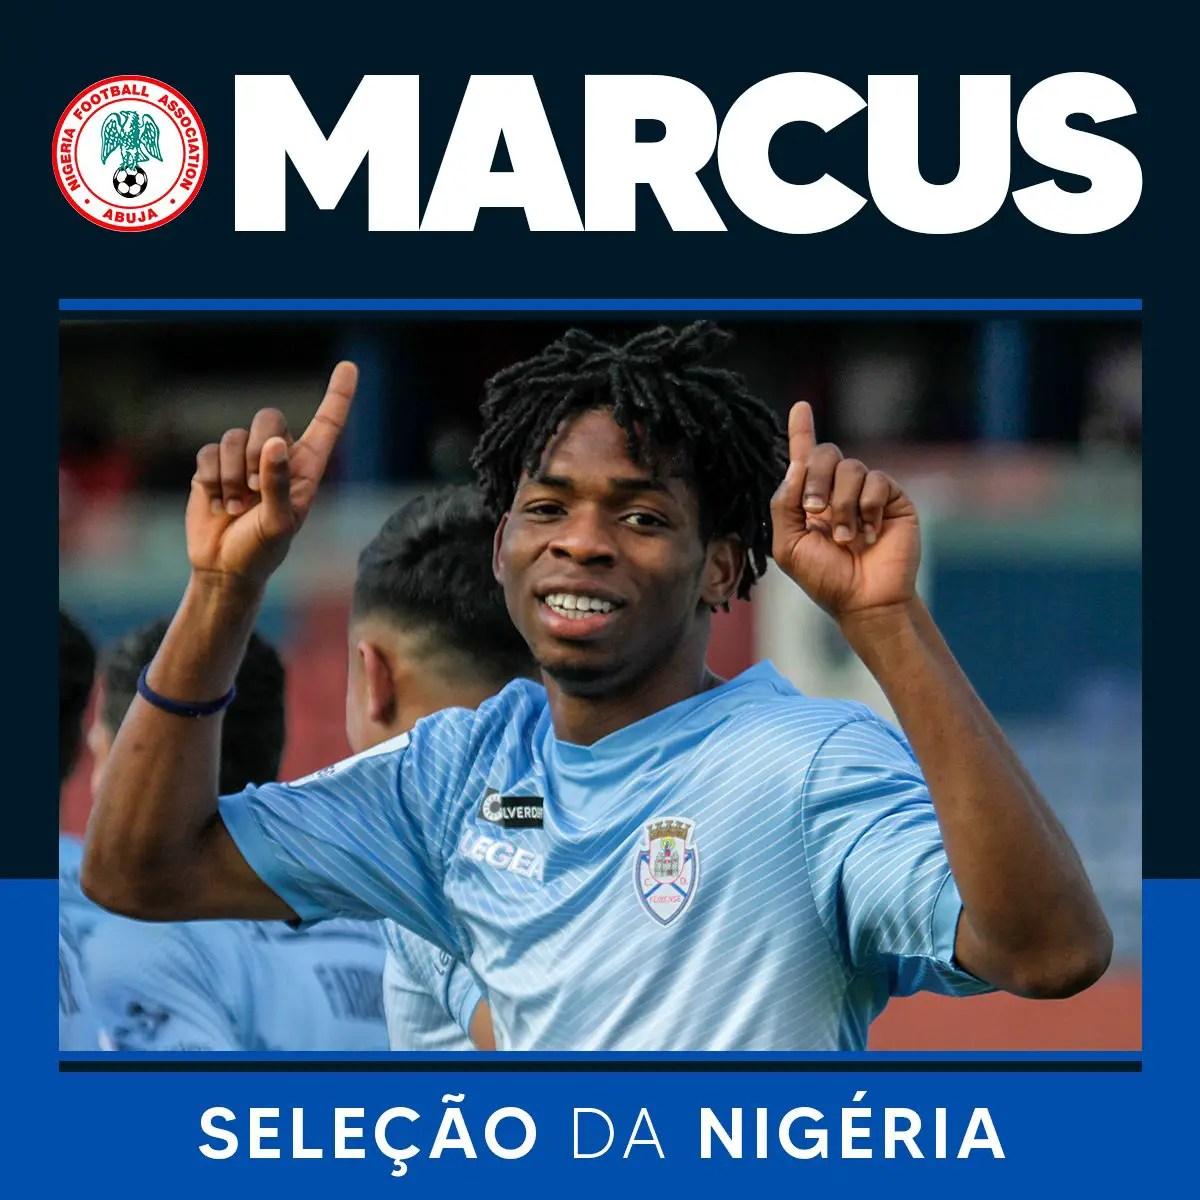 CD Feirense Celebrate  Marcus' Super Eagles Invitation For Cameroon Friendly